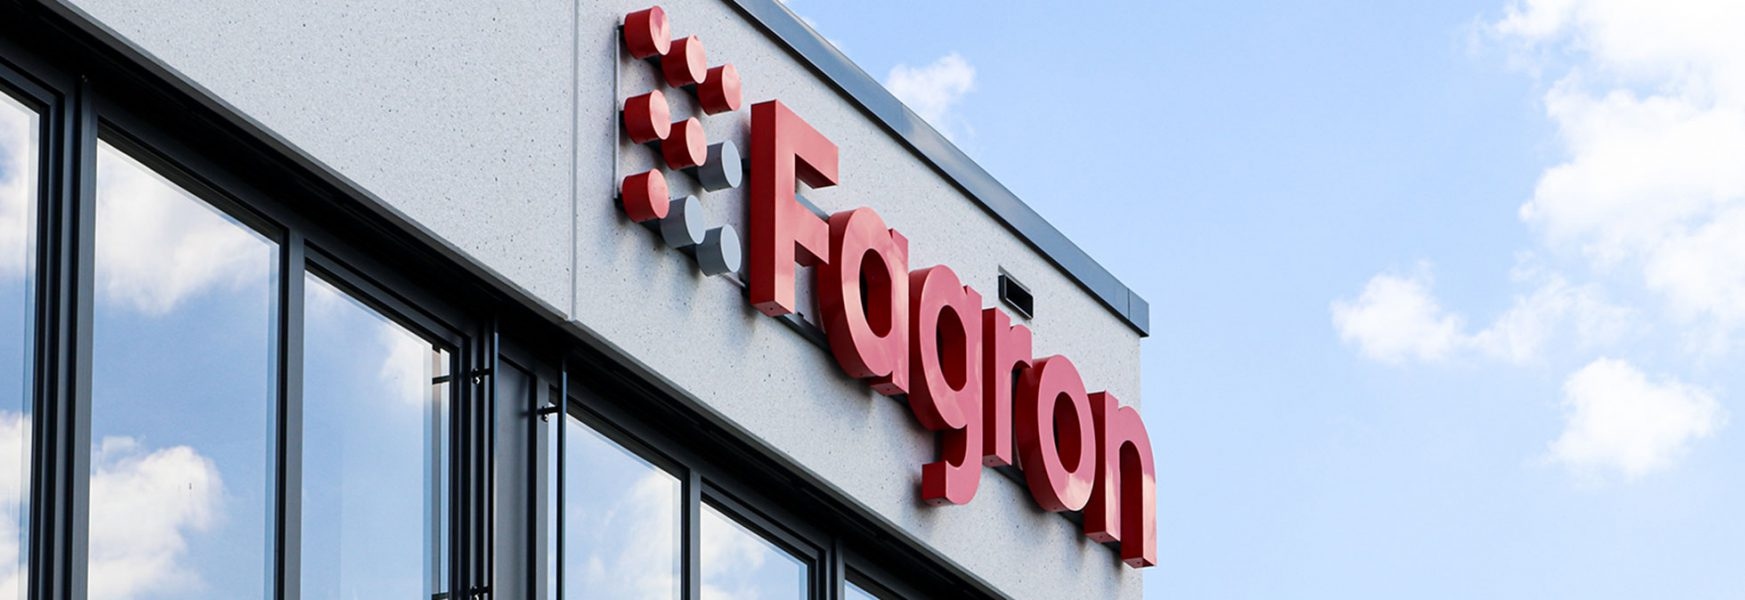 Titel_Fagron-Kontakt_1960x5674_2